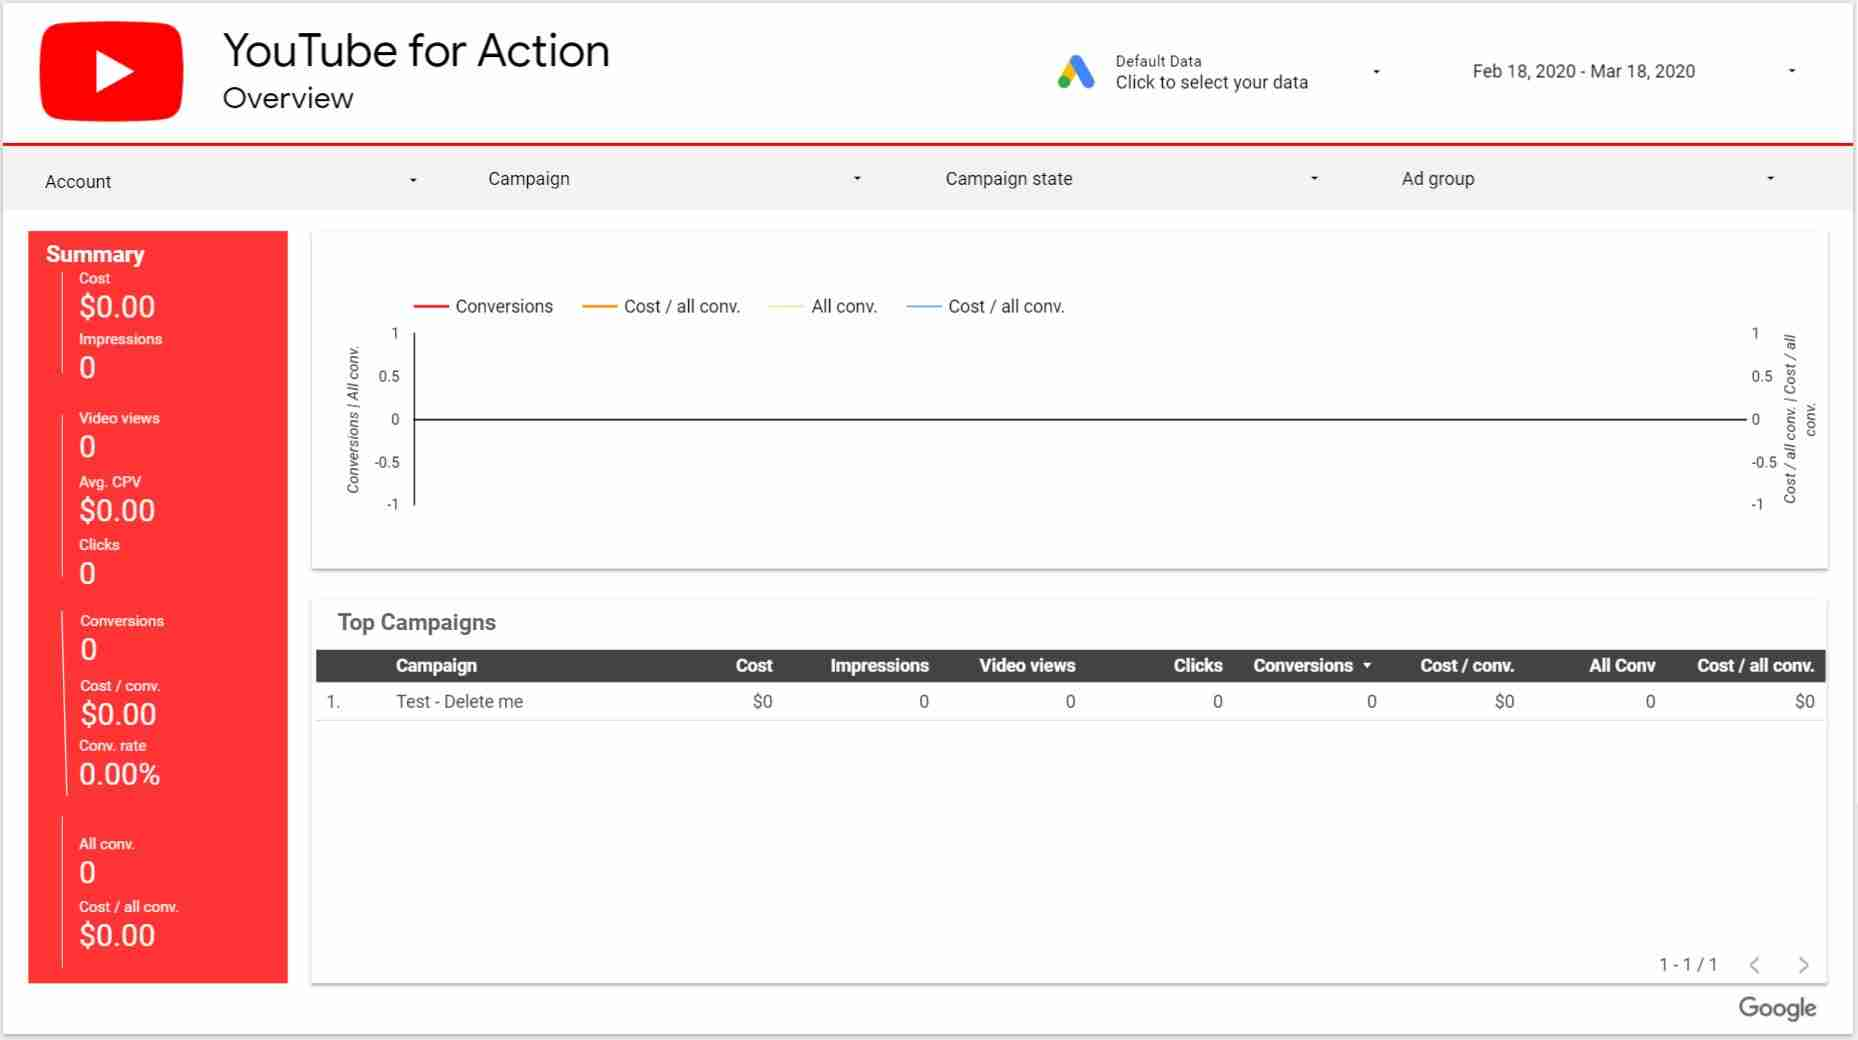 youtube dashboard in google data studio